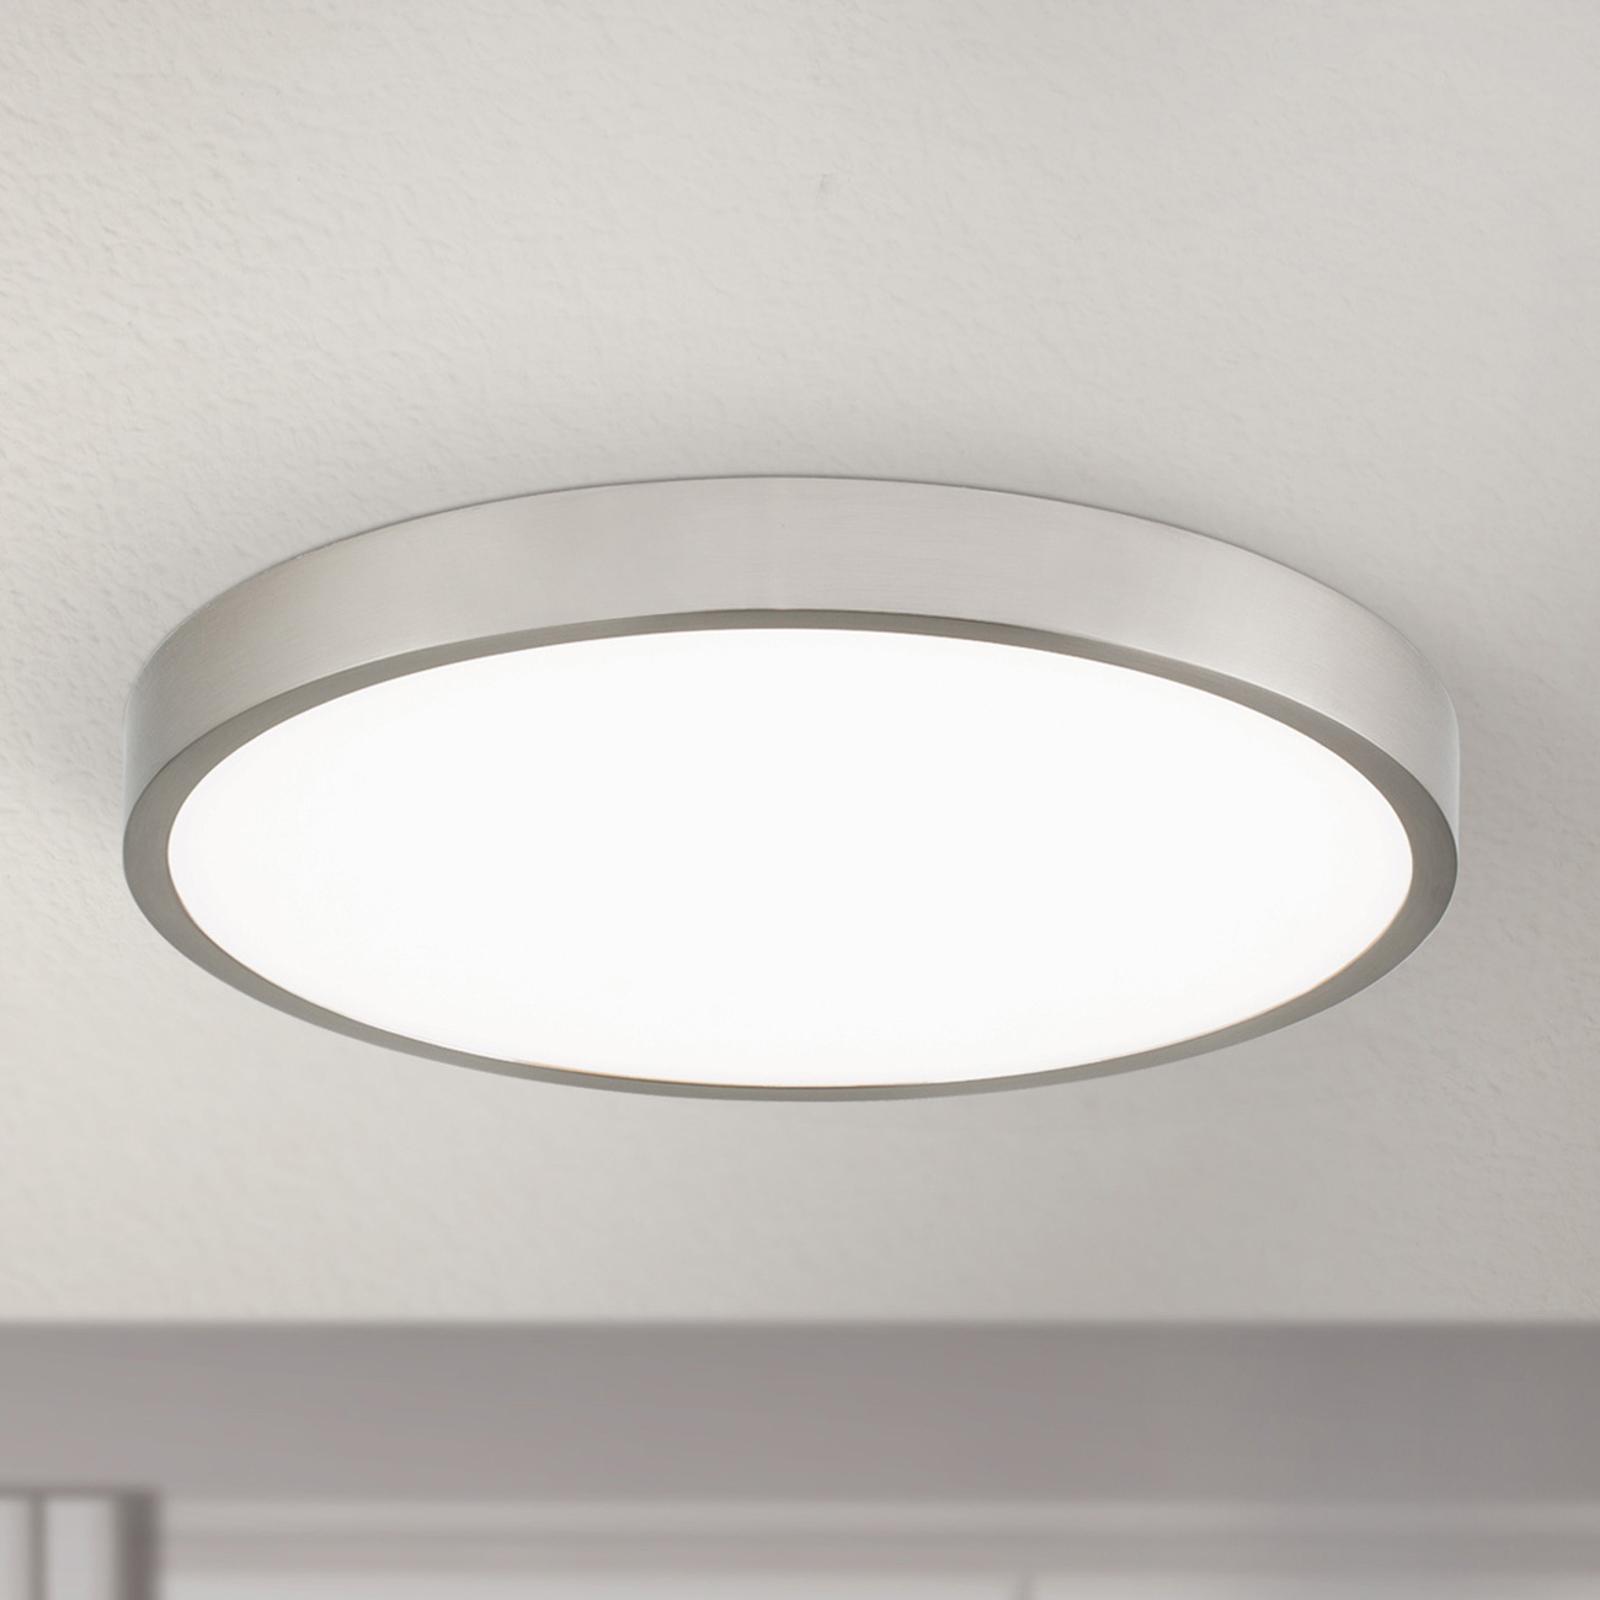 LED plafondlamp Bully, satijn 24 cm